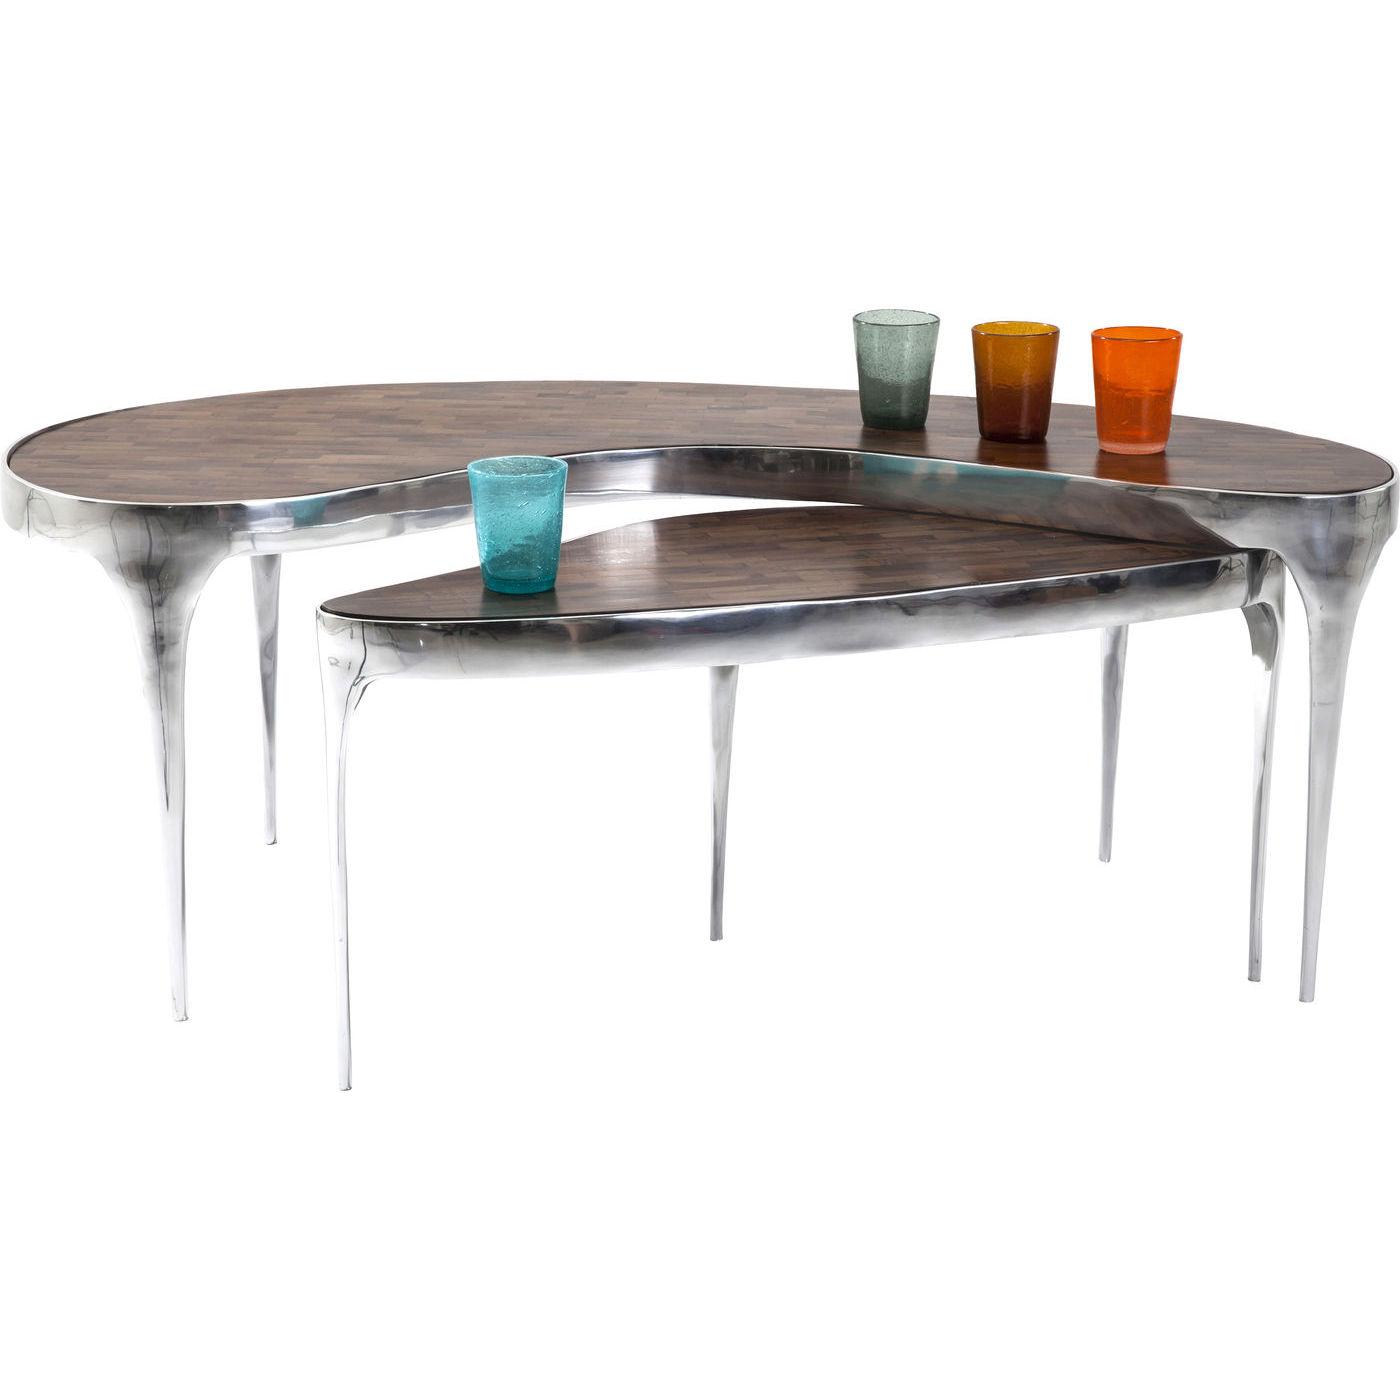 Kare design have a break sofabord - brunt mangotræ/sølv aluminium (2/sæt) (124x55)